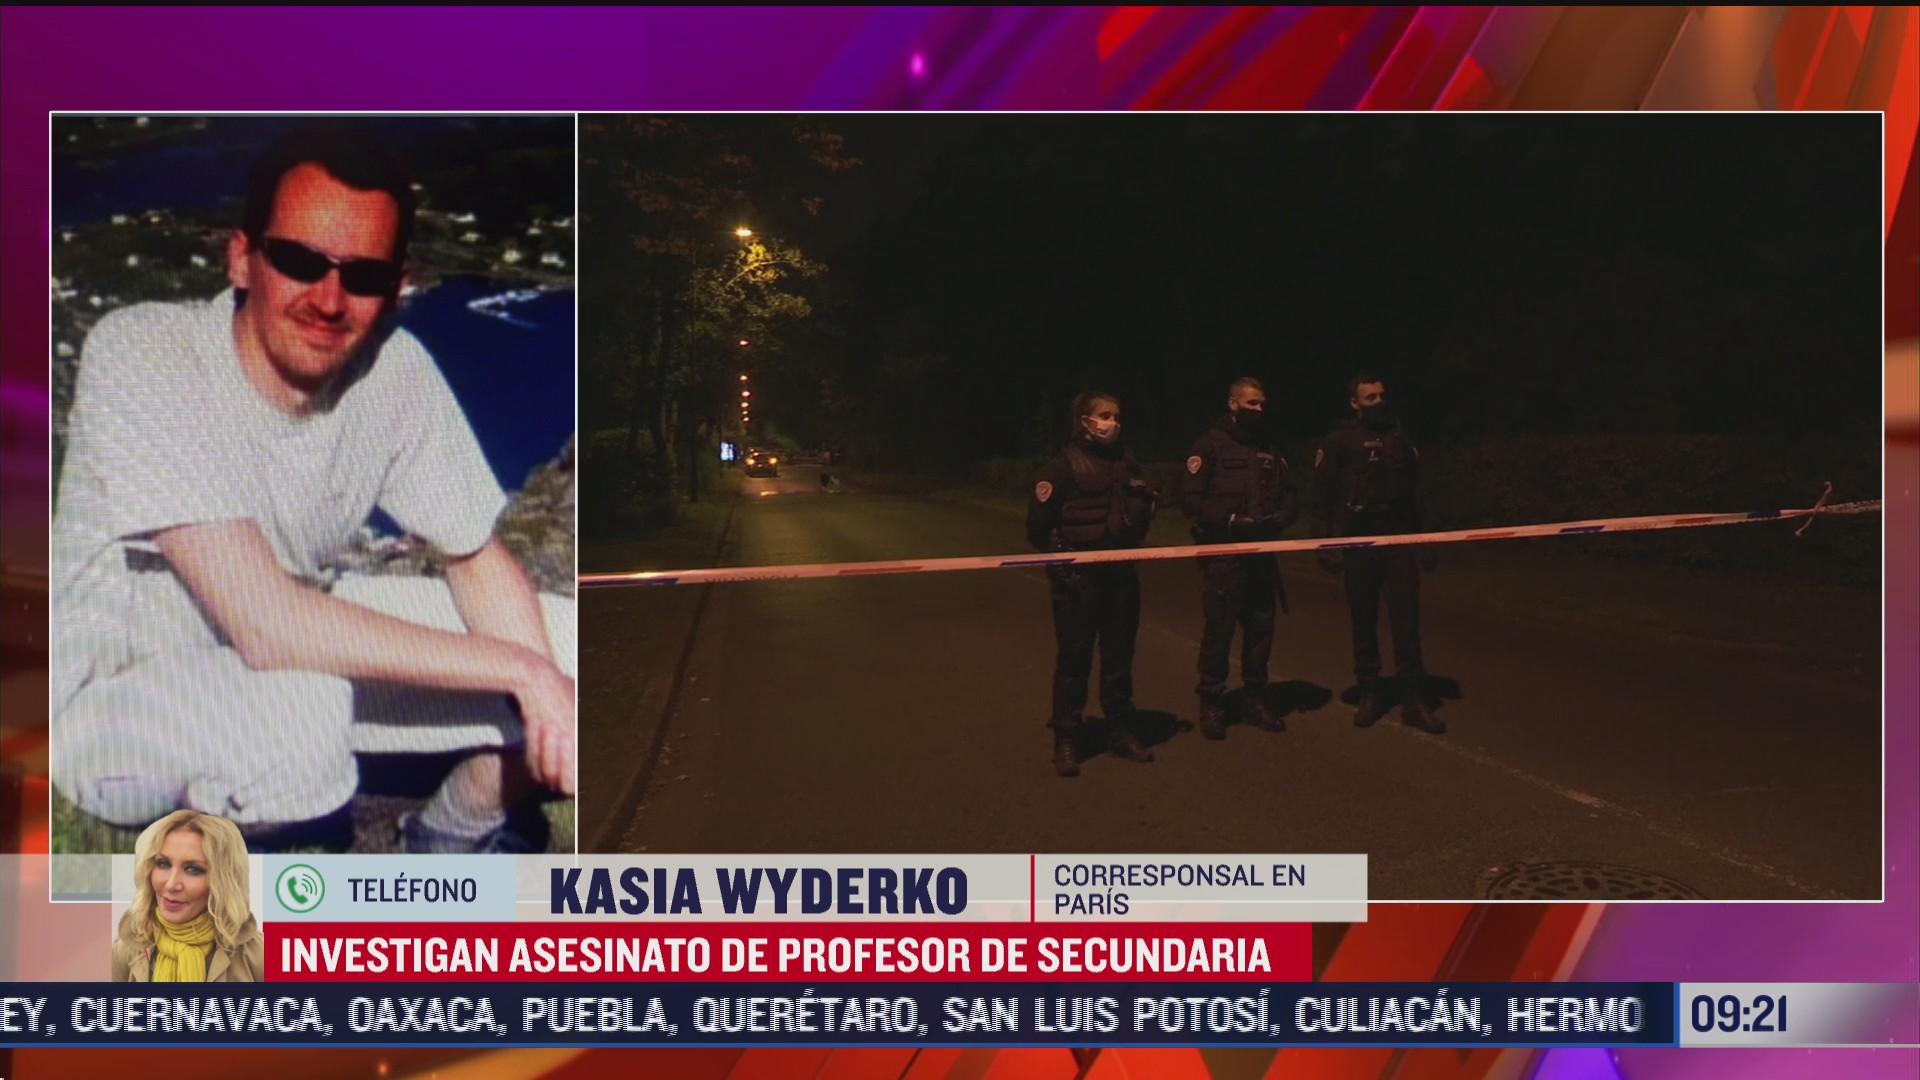 macron califica de ataque terrorista islamista el asesinato de un profesor